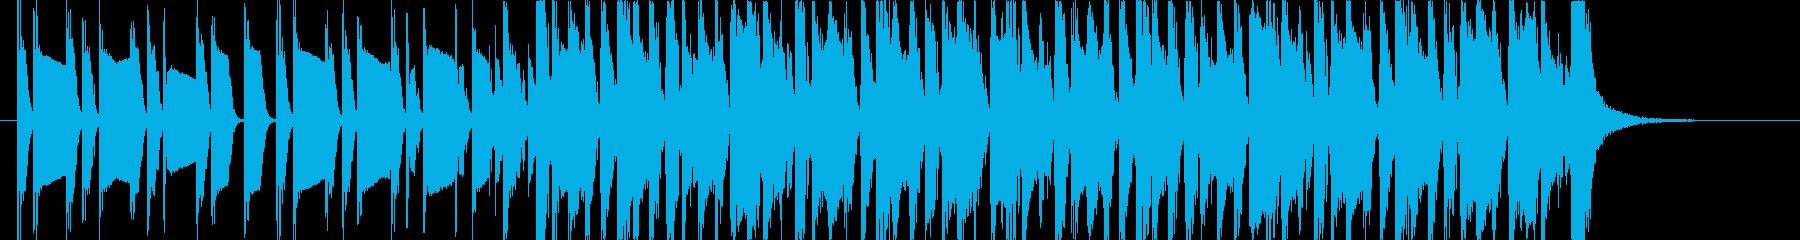 cmに使われるビンテージロックの再生済みの波形